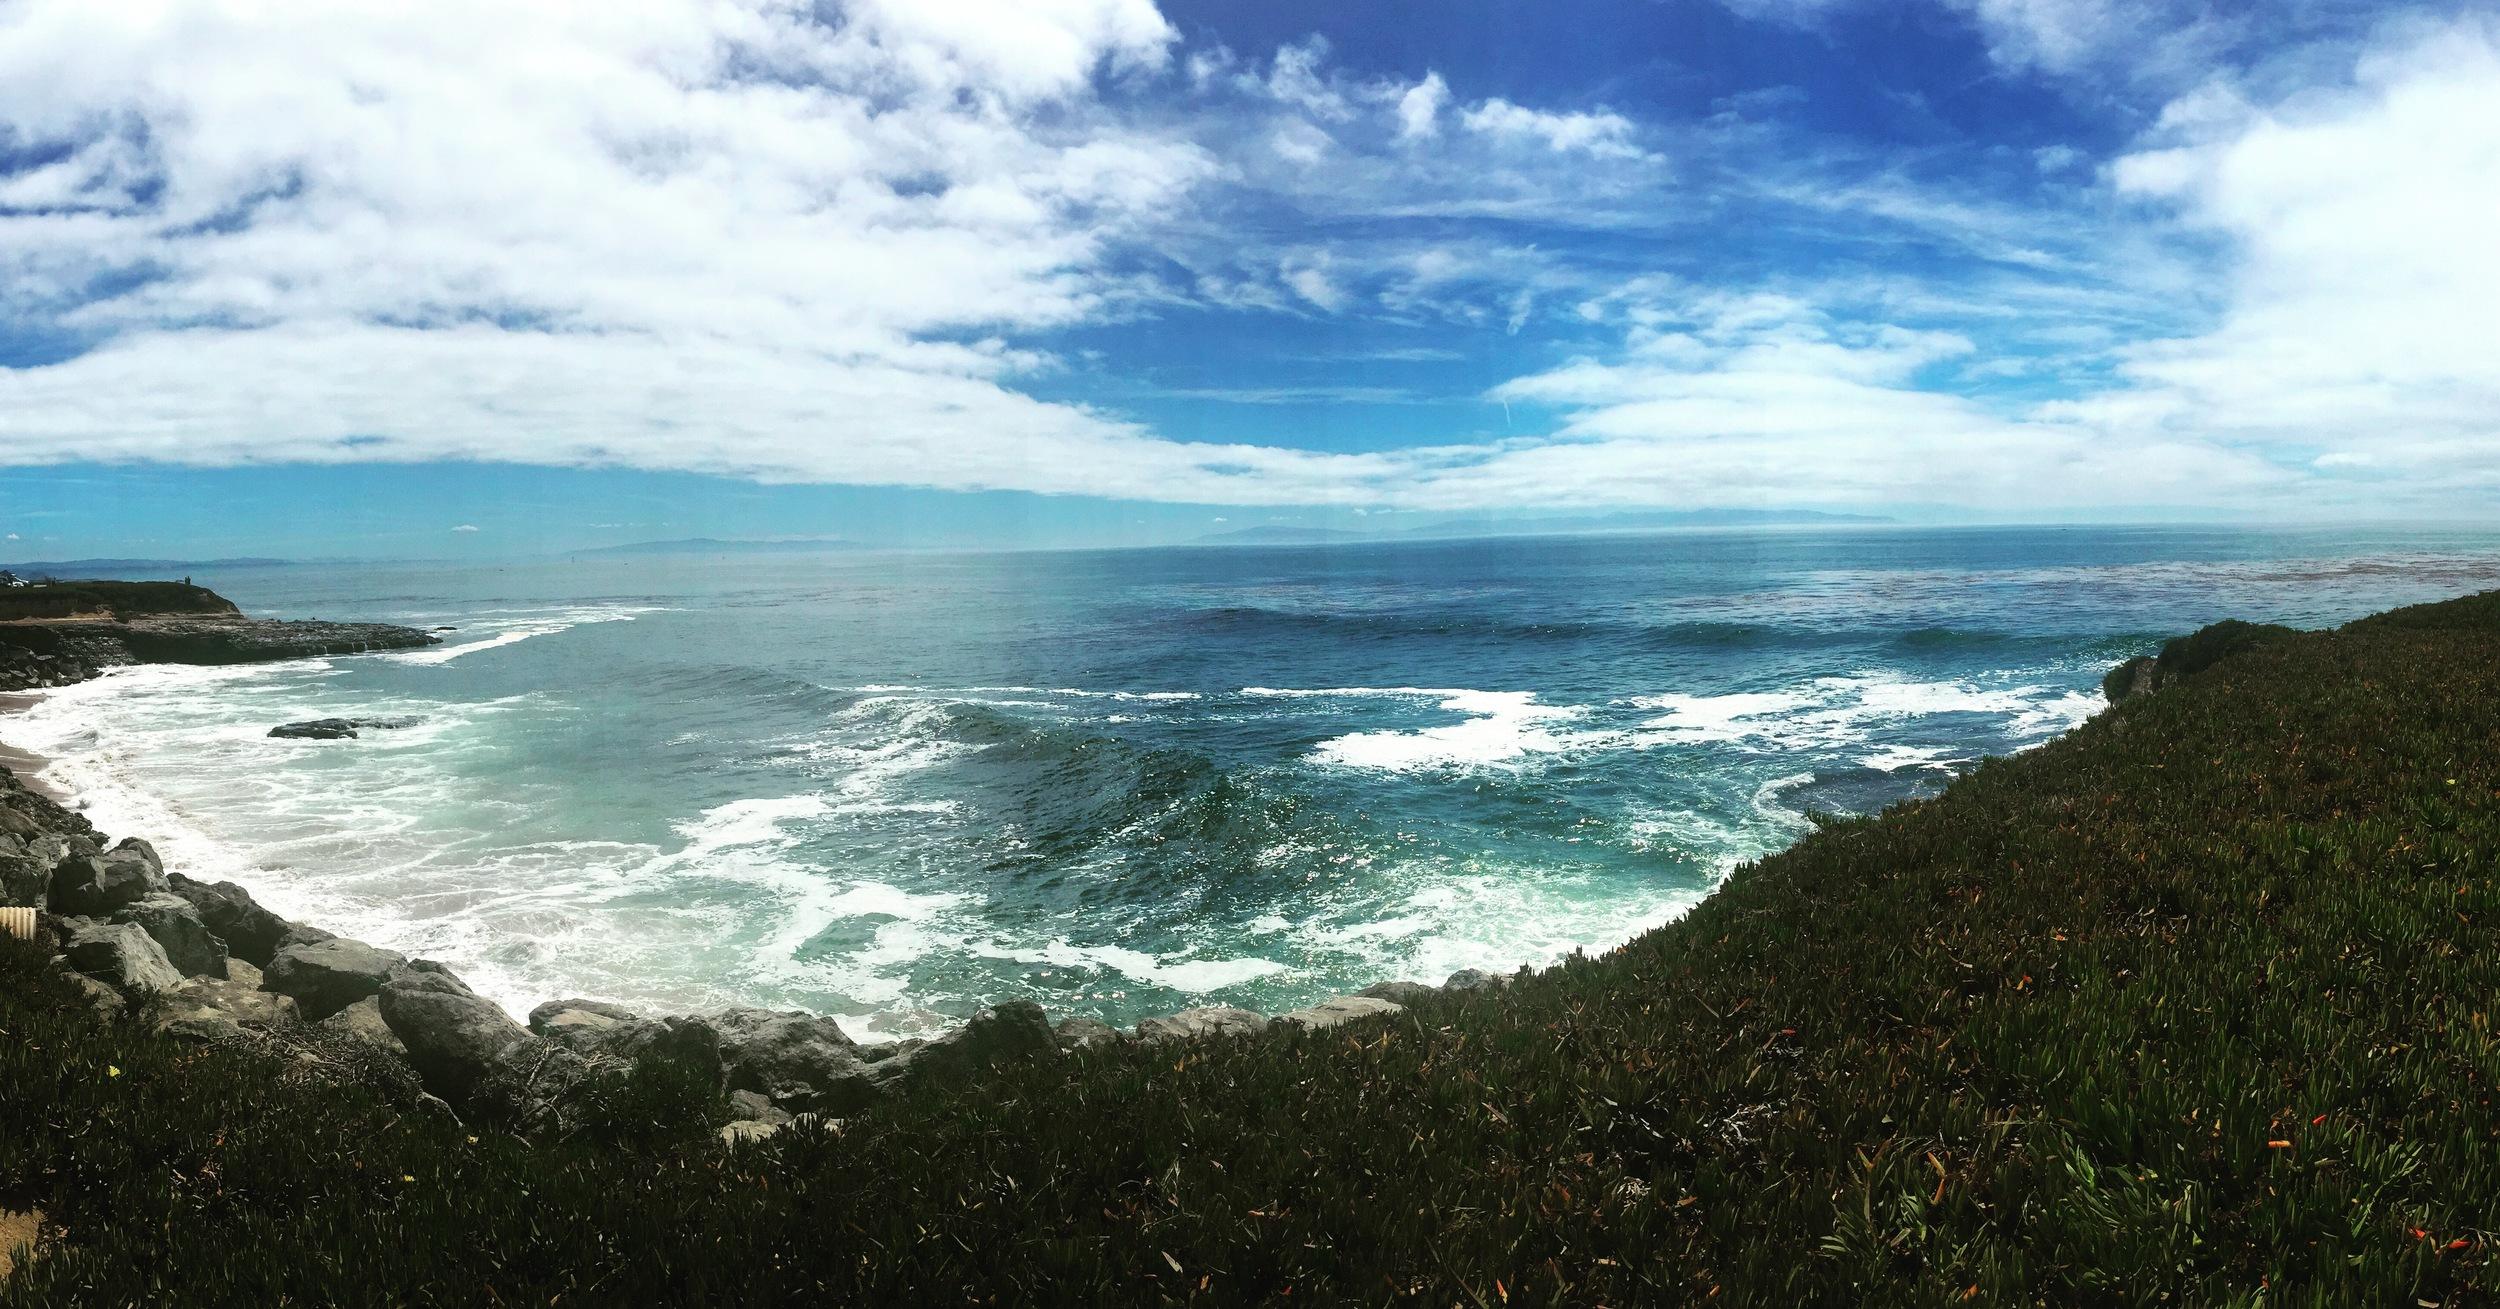 View along West Cliff in Santa Cruz, 50 miles in...